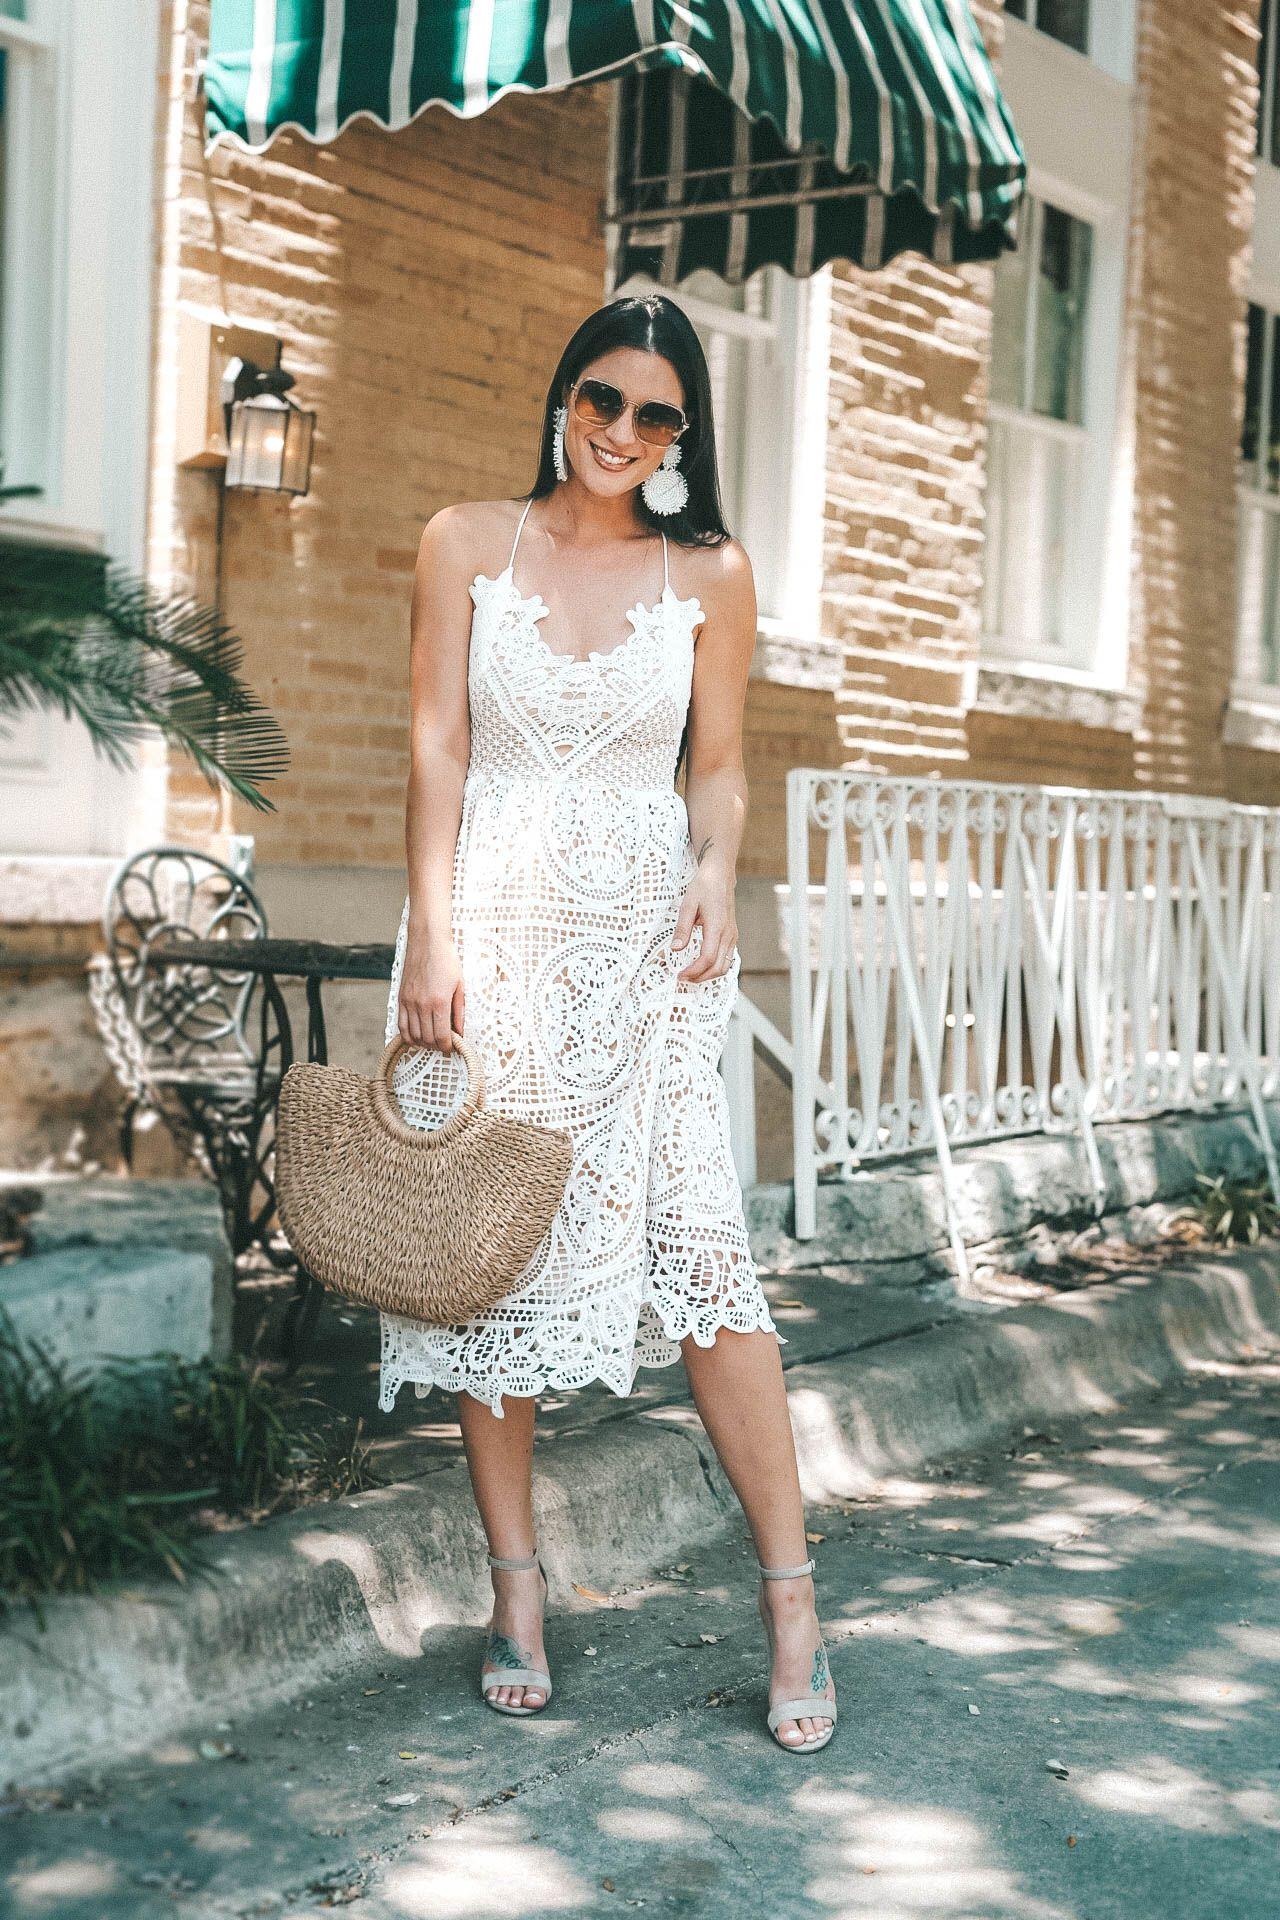 White Lace Dress Under 100 Women S Fashion Dressed To Kill Lace White Dress Lace Summer Dresses Lace Dress [ 1920 x 1280 Pixel ]